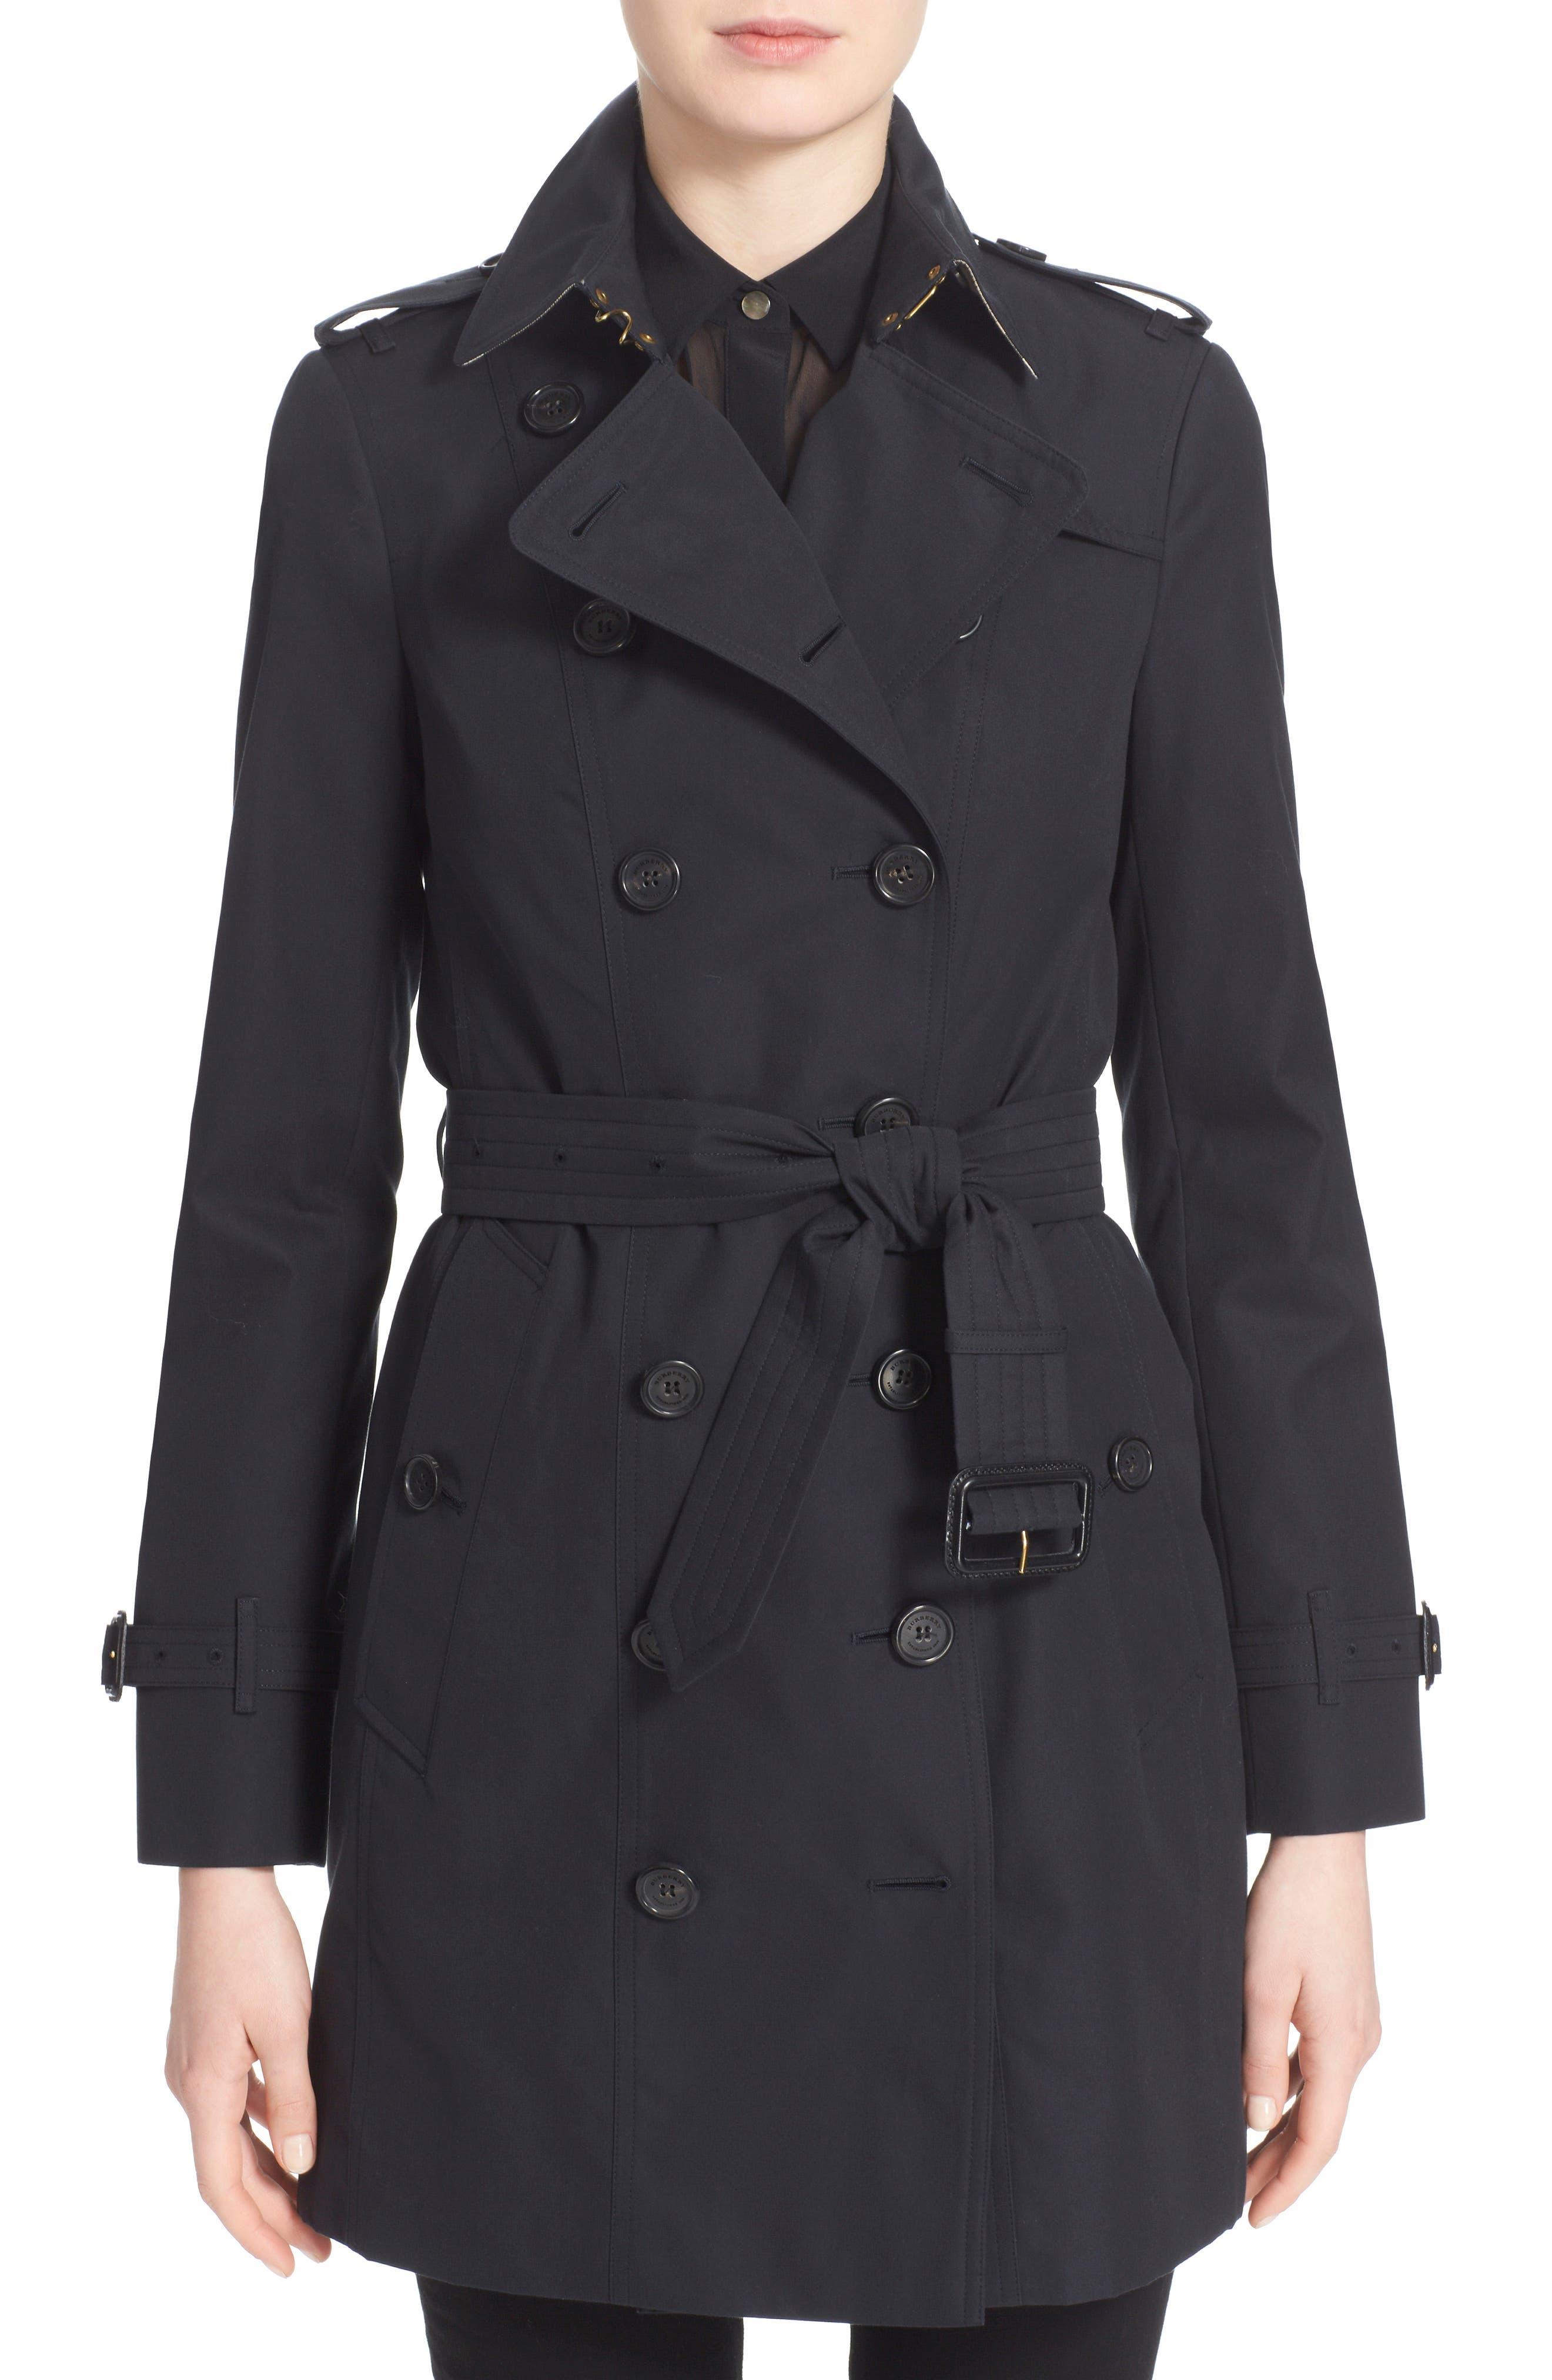 Burberry Sandringham Mid Slim Trench Coat